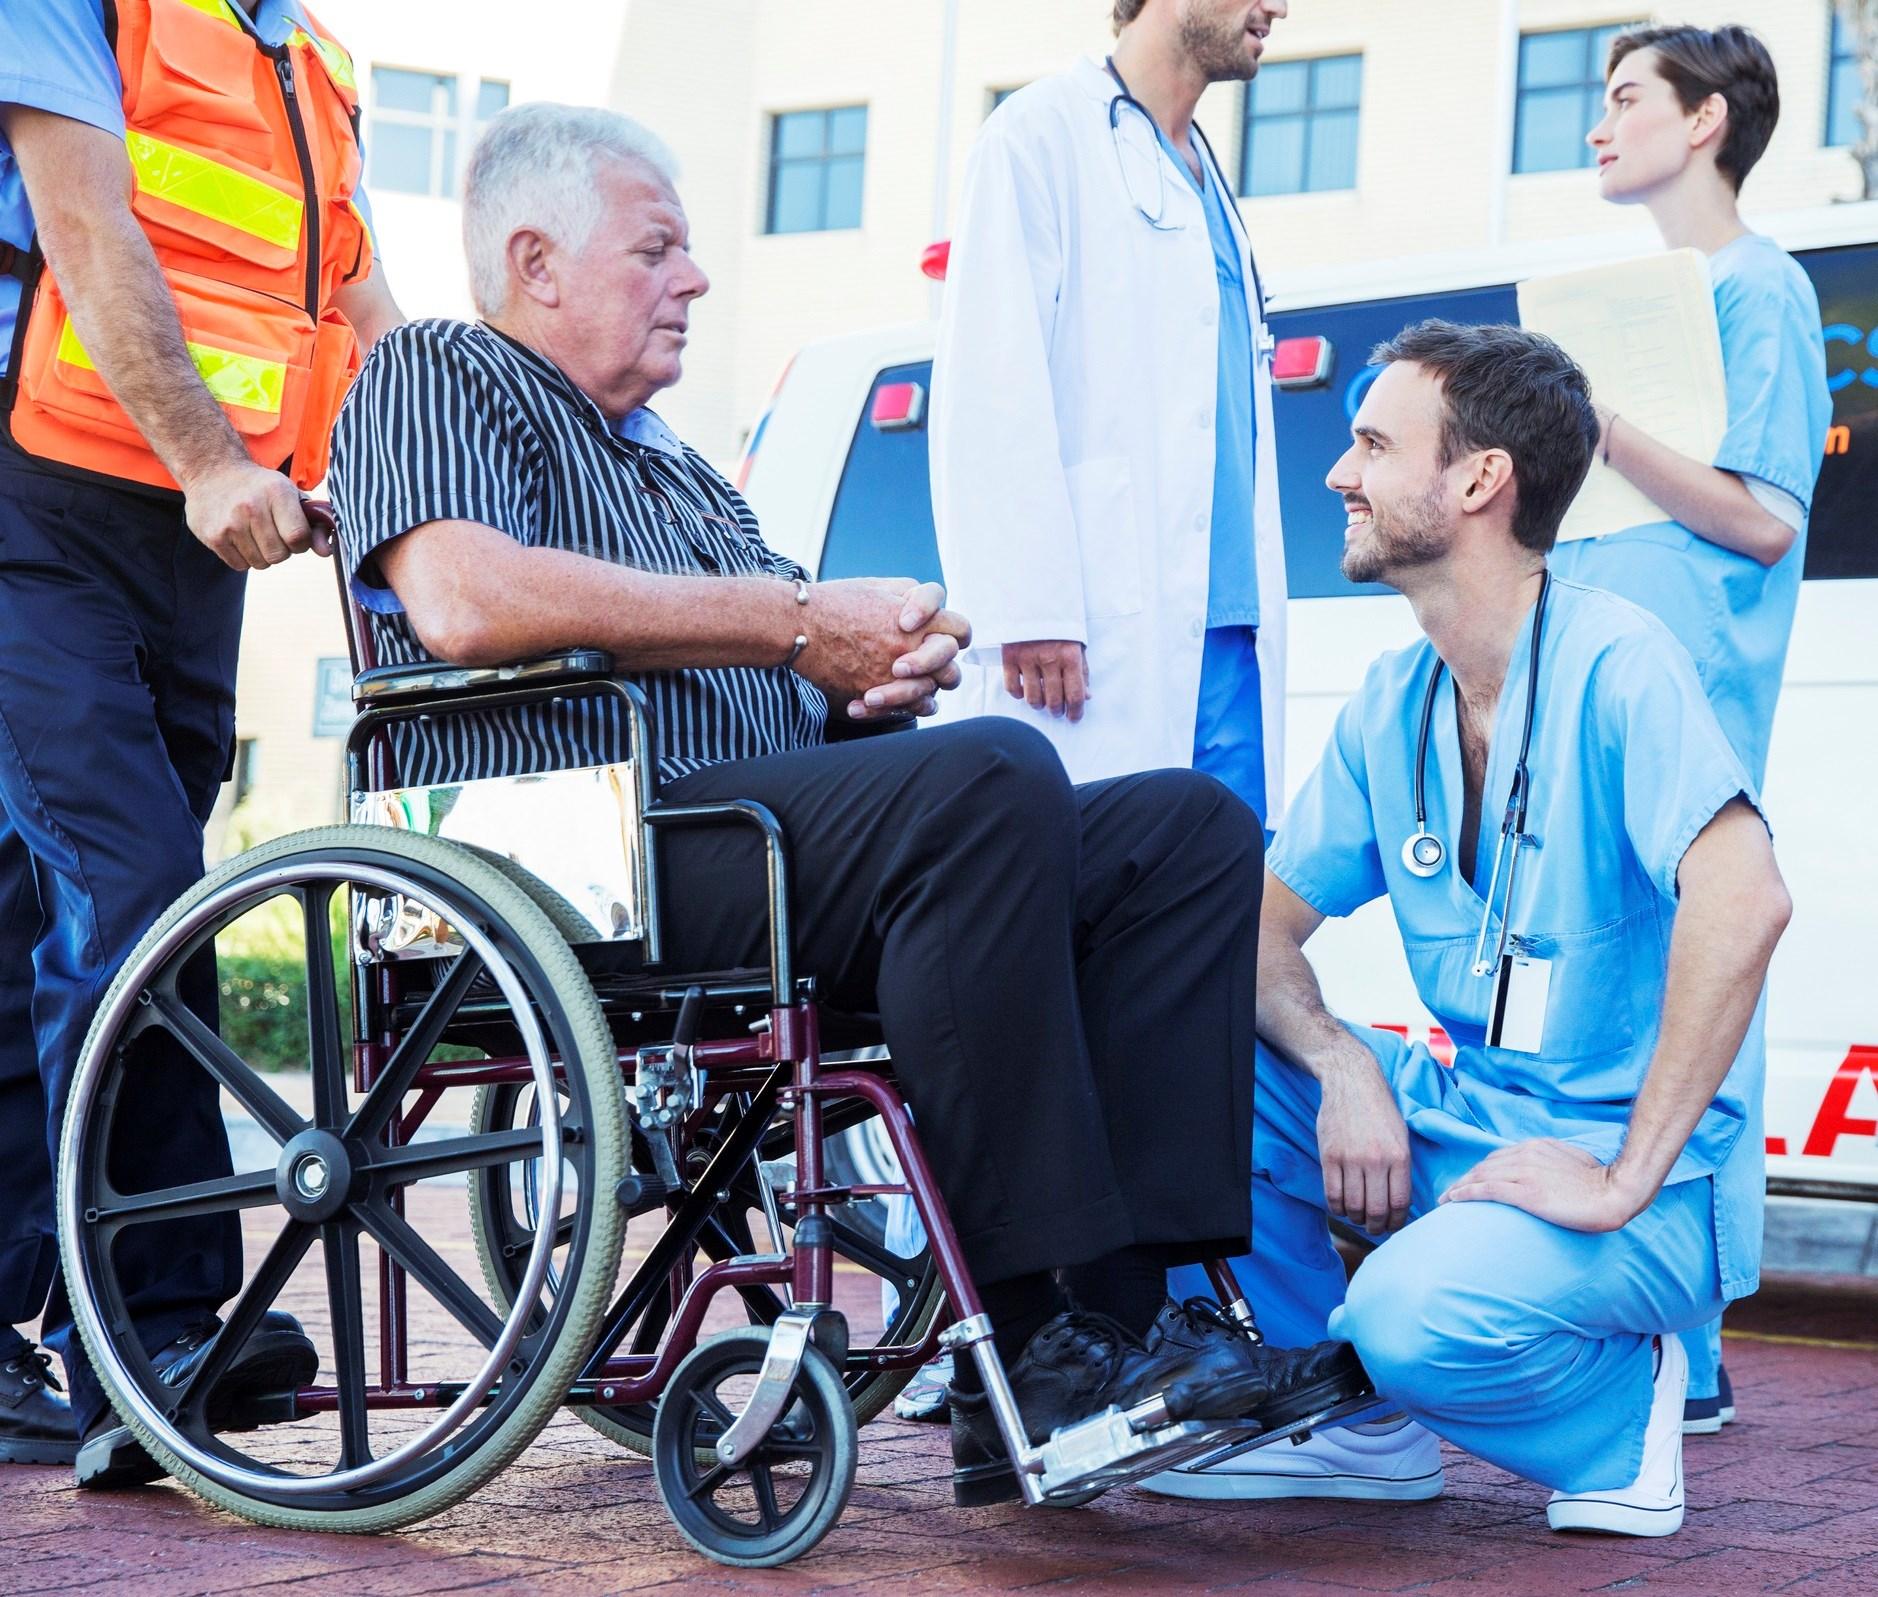 Veterans Health Administration Hospitals Outperform Non-VHAs